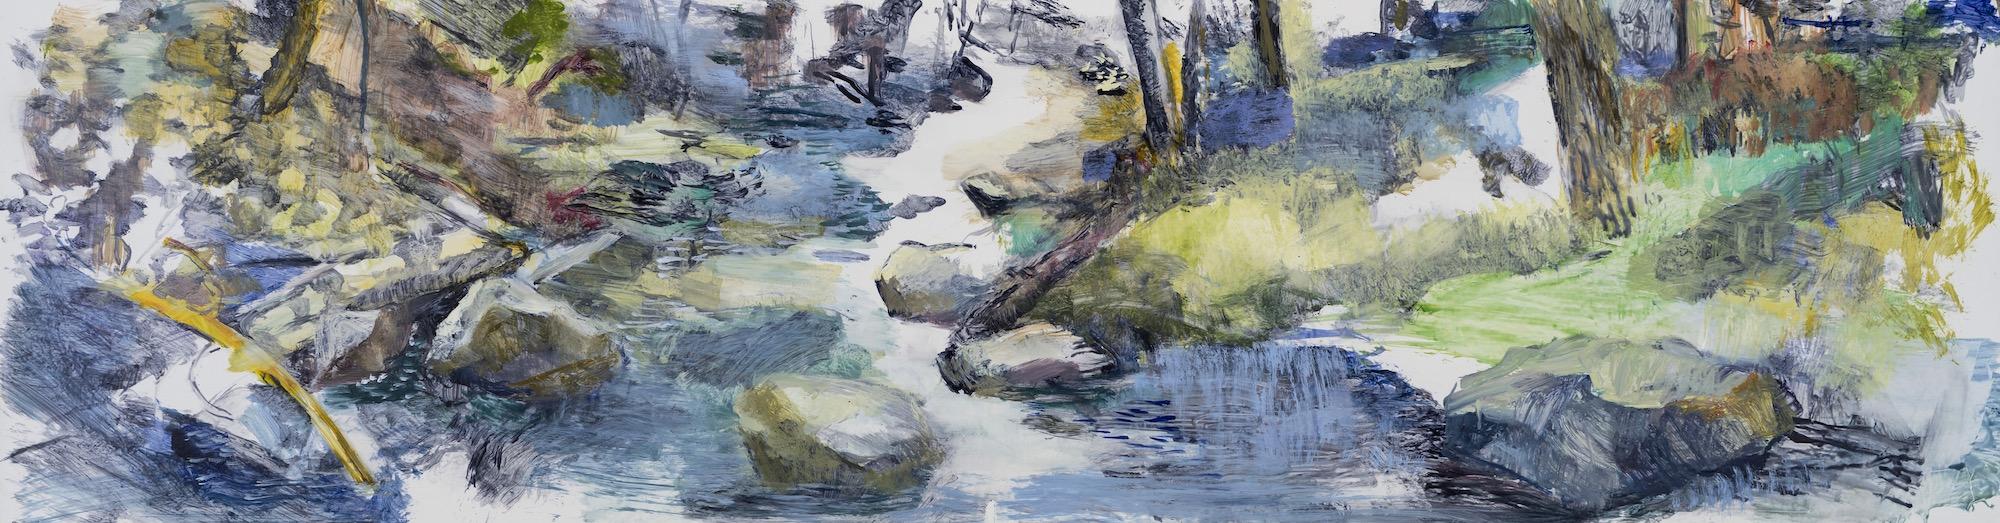 SUSAN G SCOTT Water Cascading,  2016, Huile sur Terraskin | Oil on TerraSkin, 50.8 x 182.88 cm | 20″ x 72″ CAD $7,360 (sans encadrement / unframed)